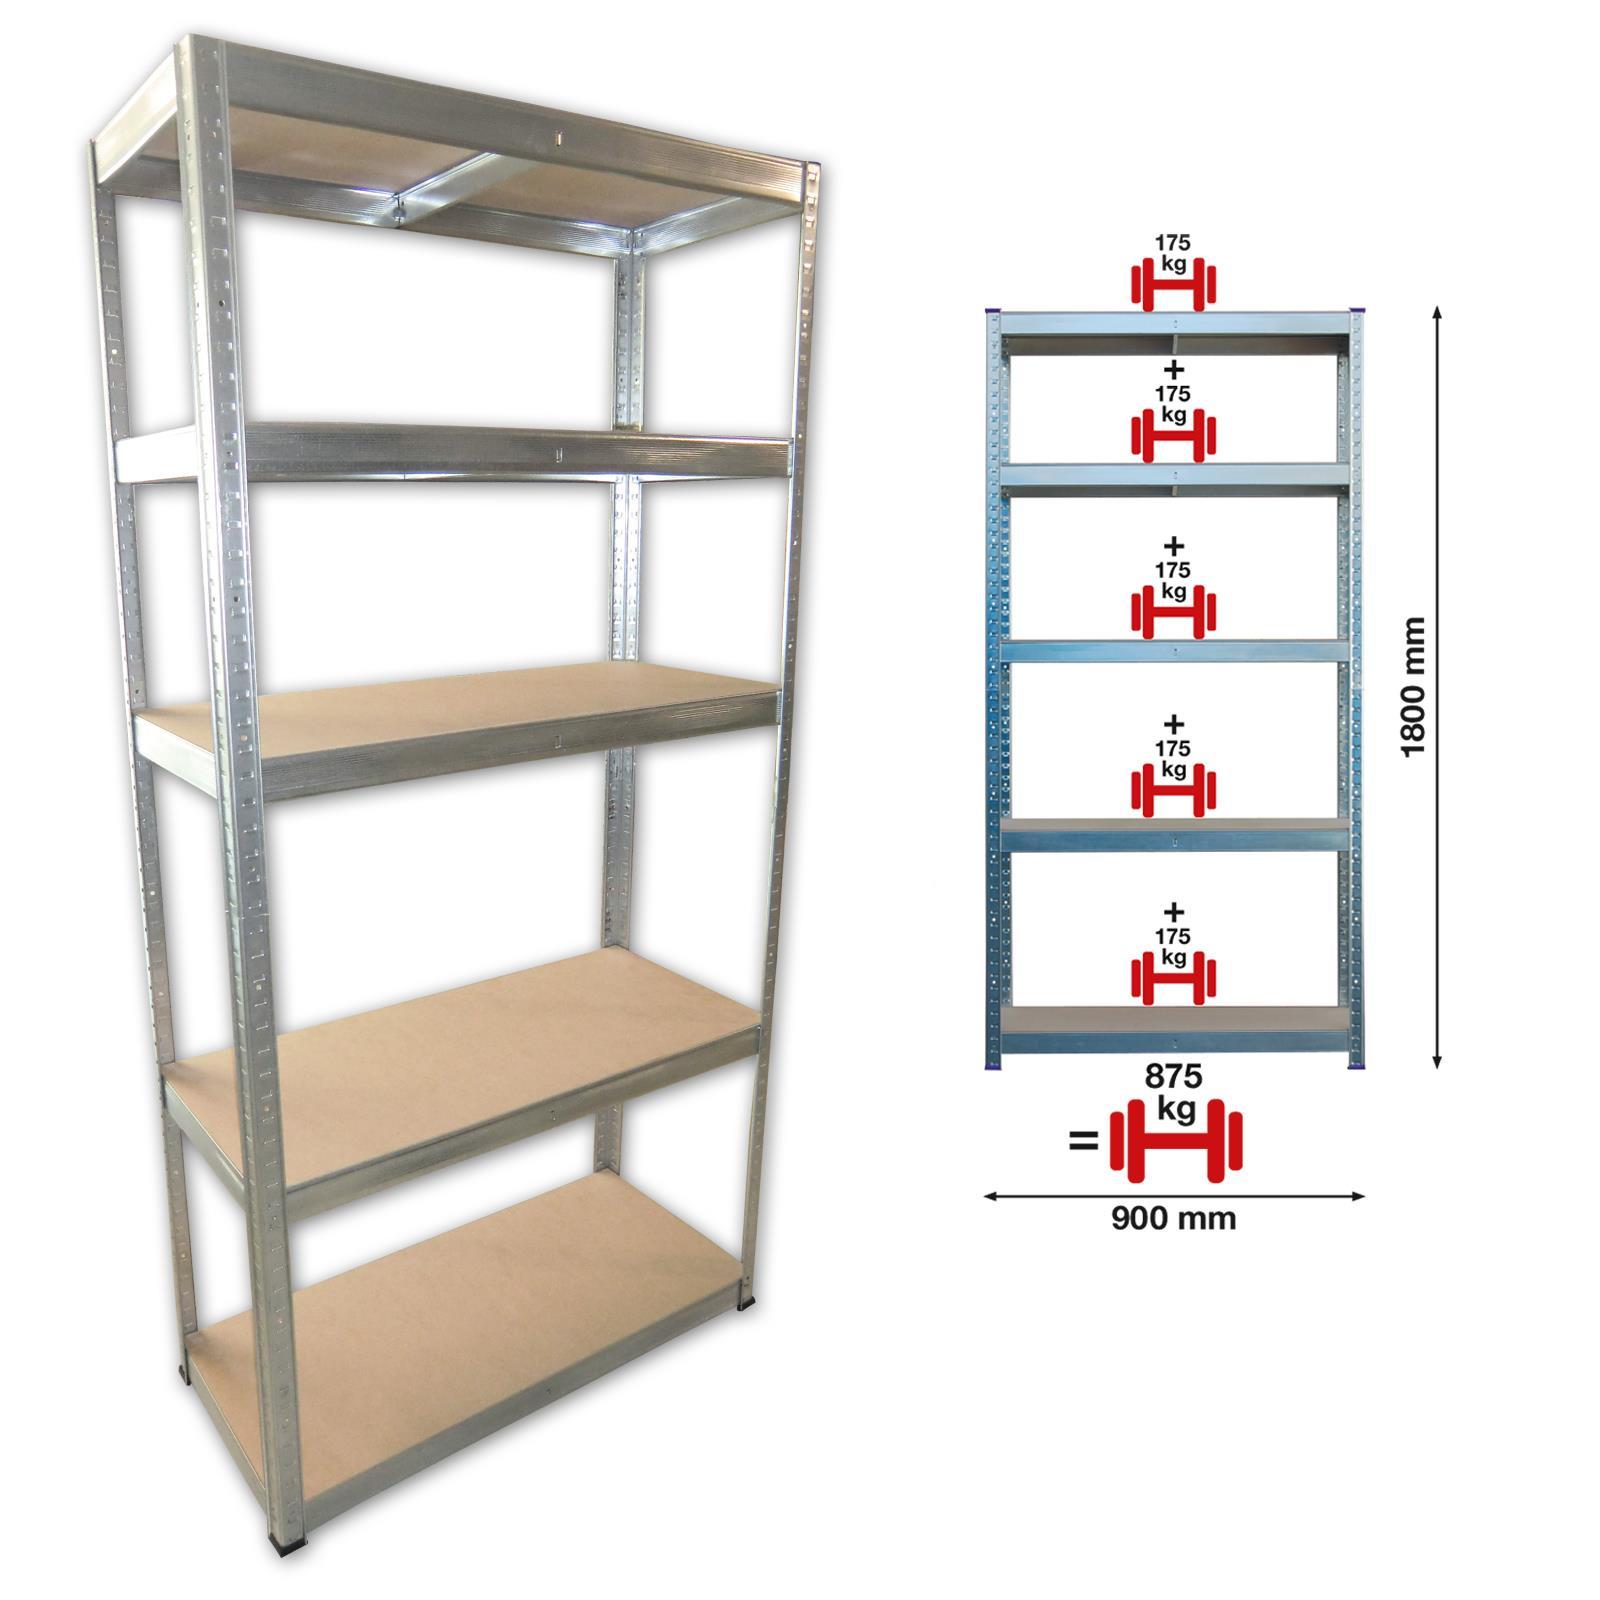 steckregal lagerregal schwerlastregal werkstattregal kellerregal regal 875 kg eu ebay. Black Bedroom Furniture Sets. Home Design Ideas